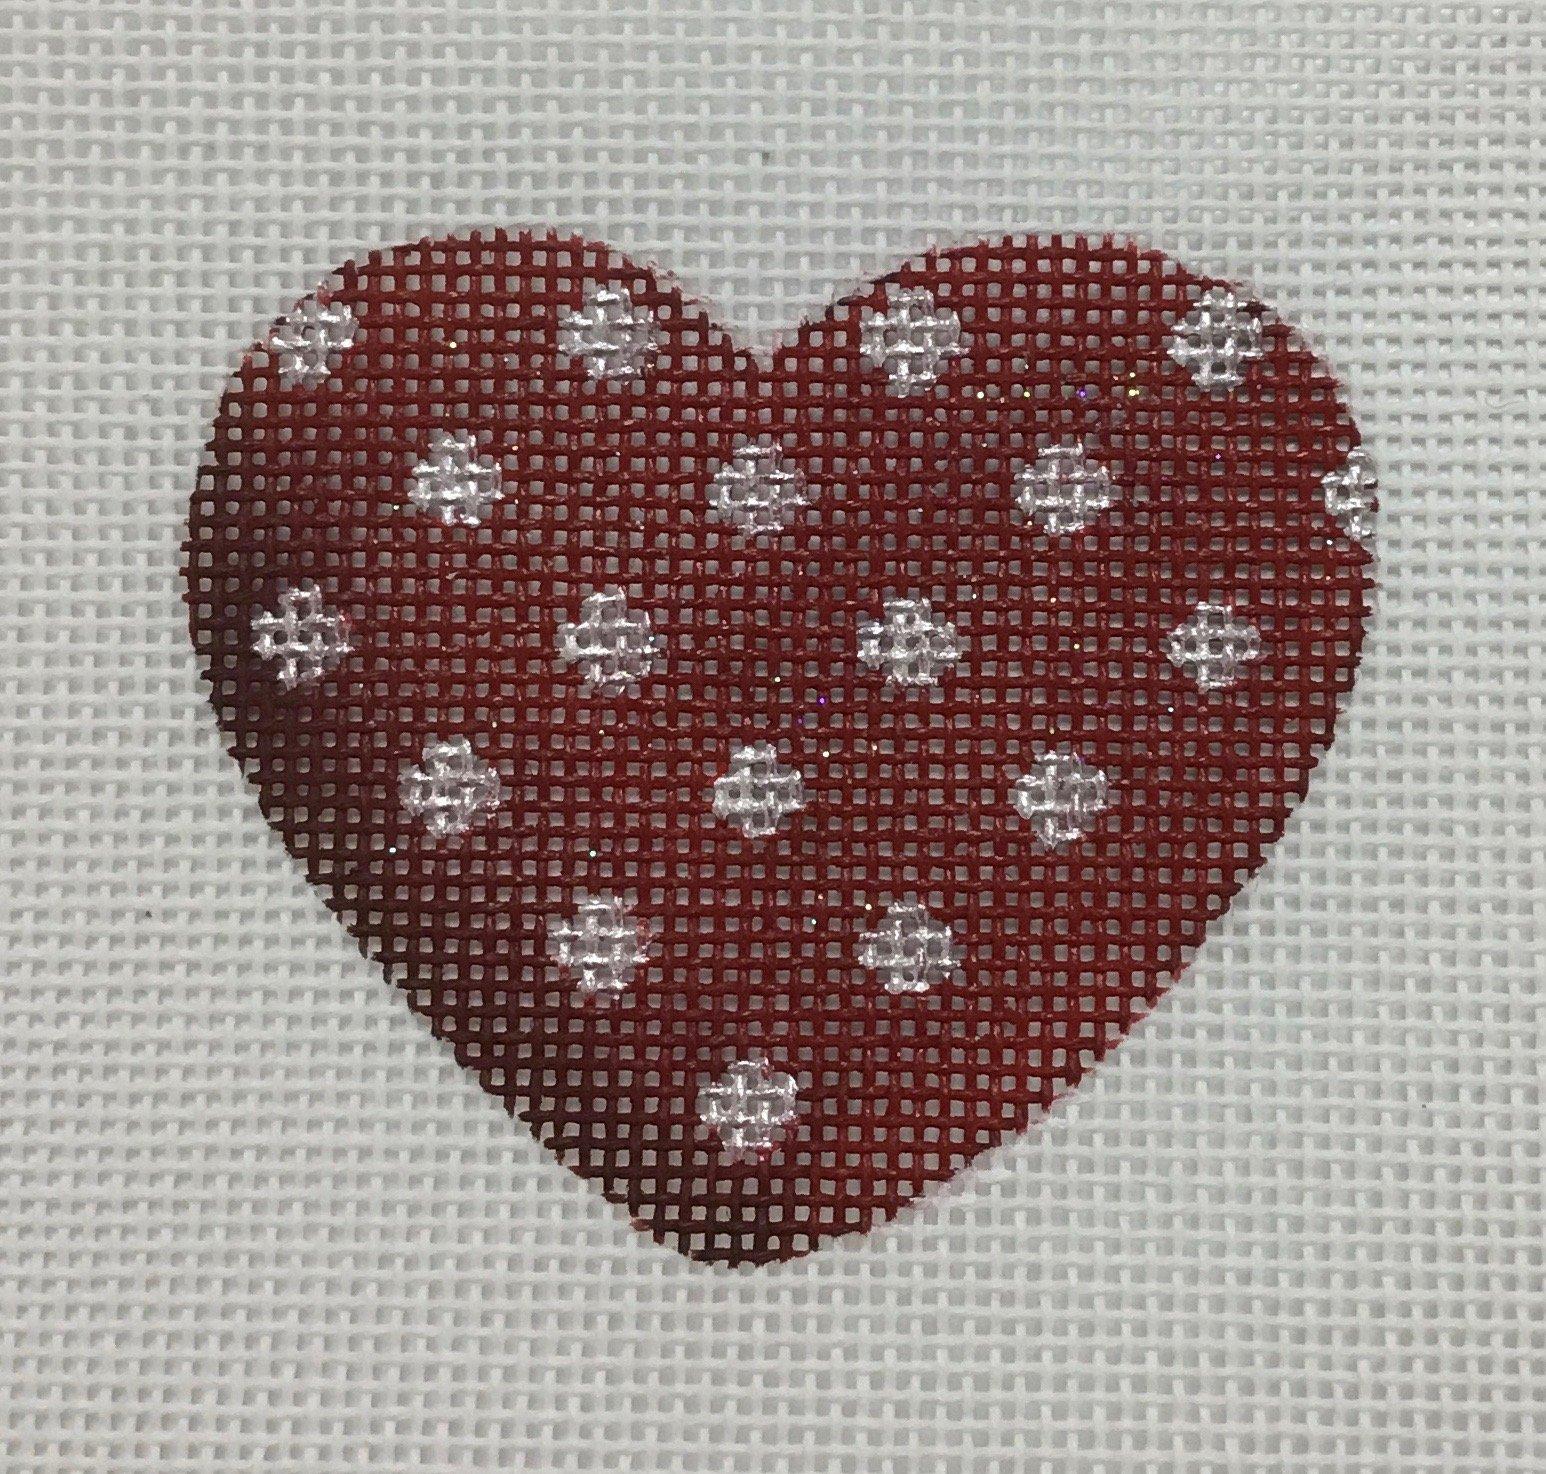 Red Polka Dot Heart, 18M, 2.75x2.75